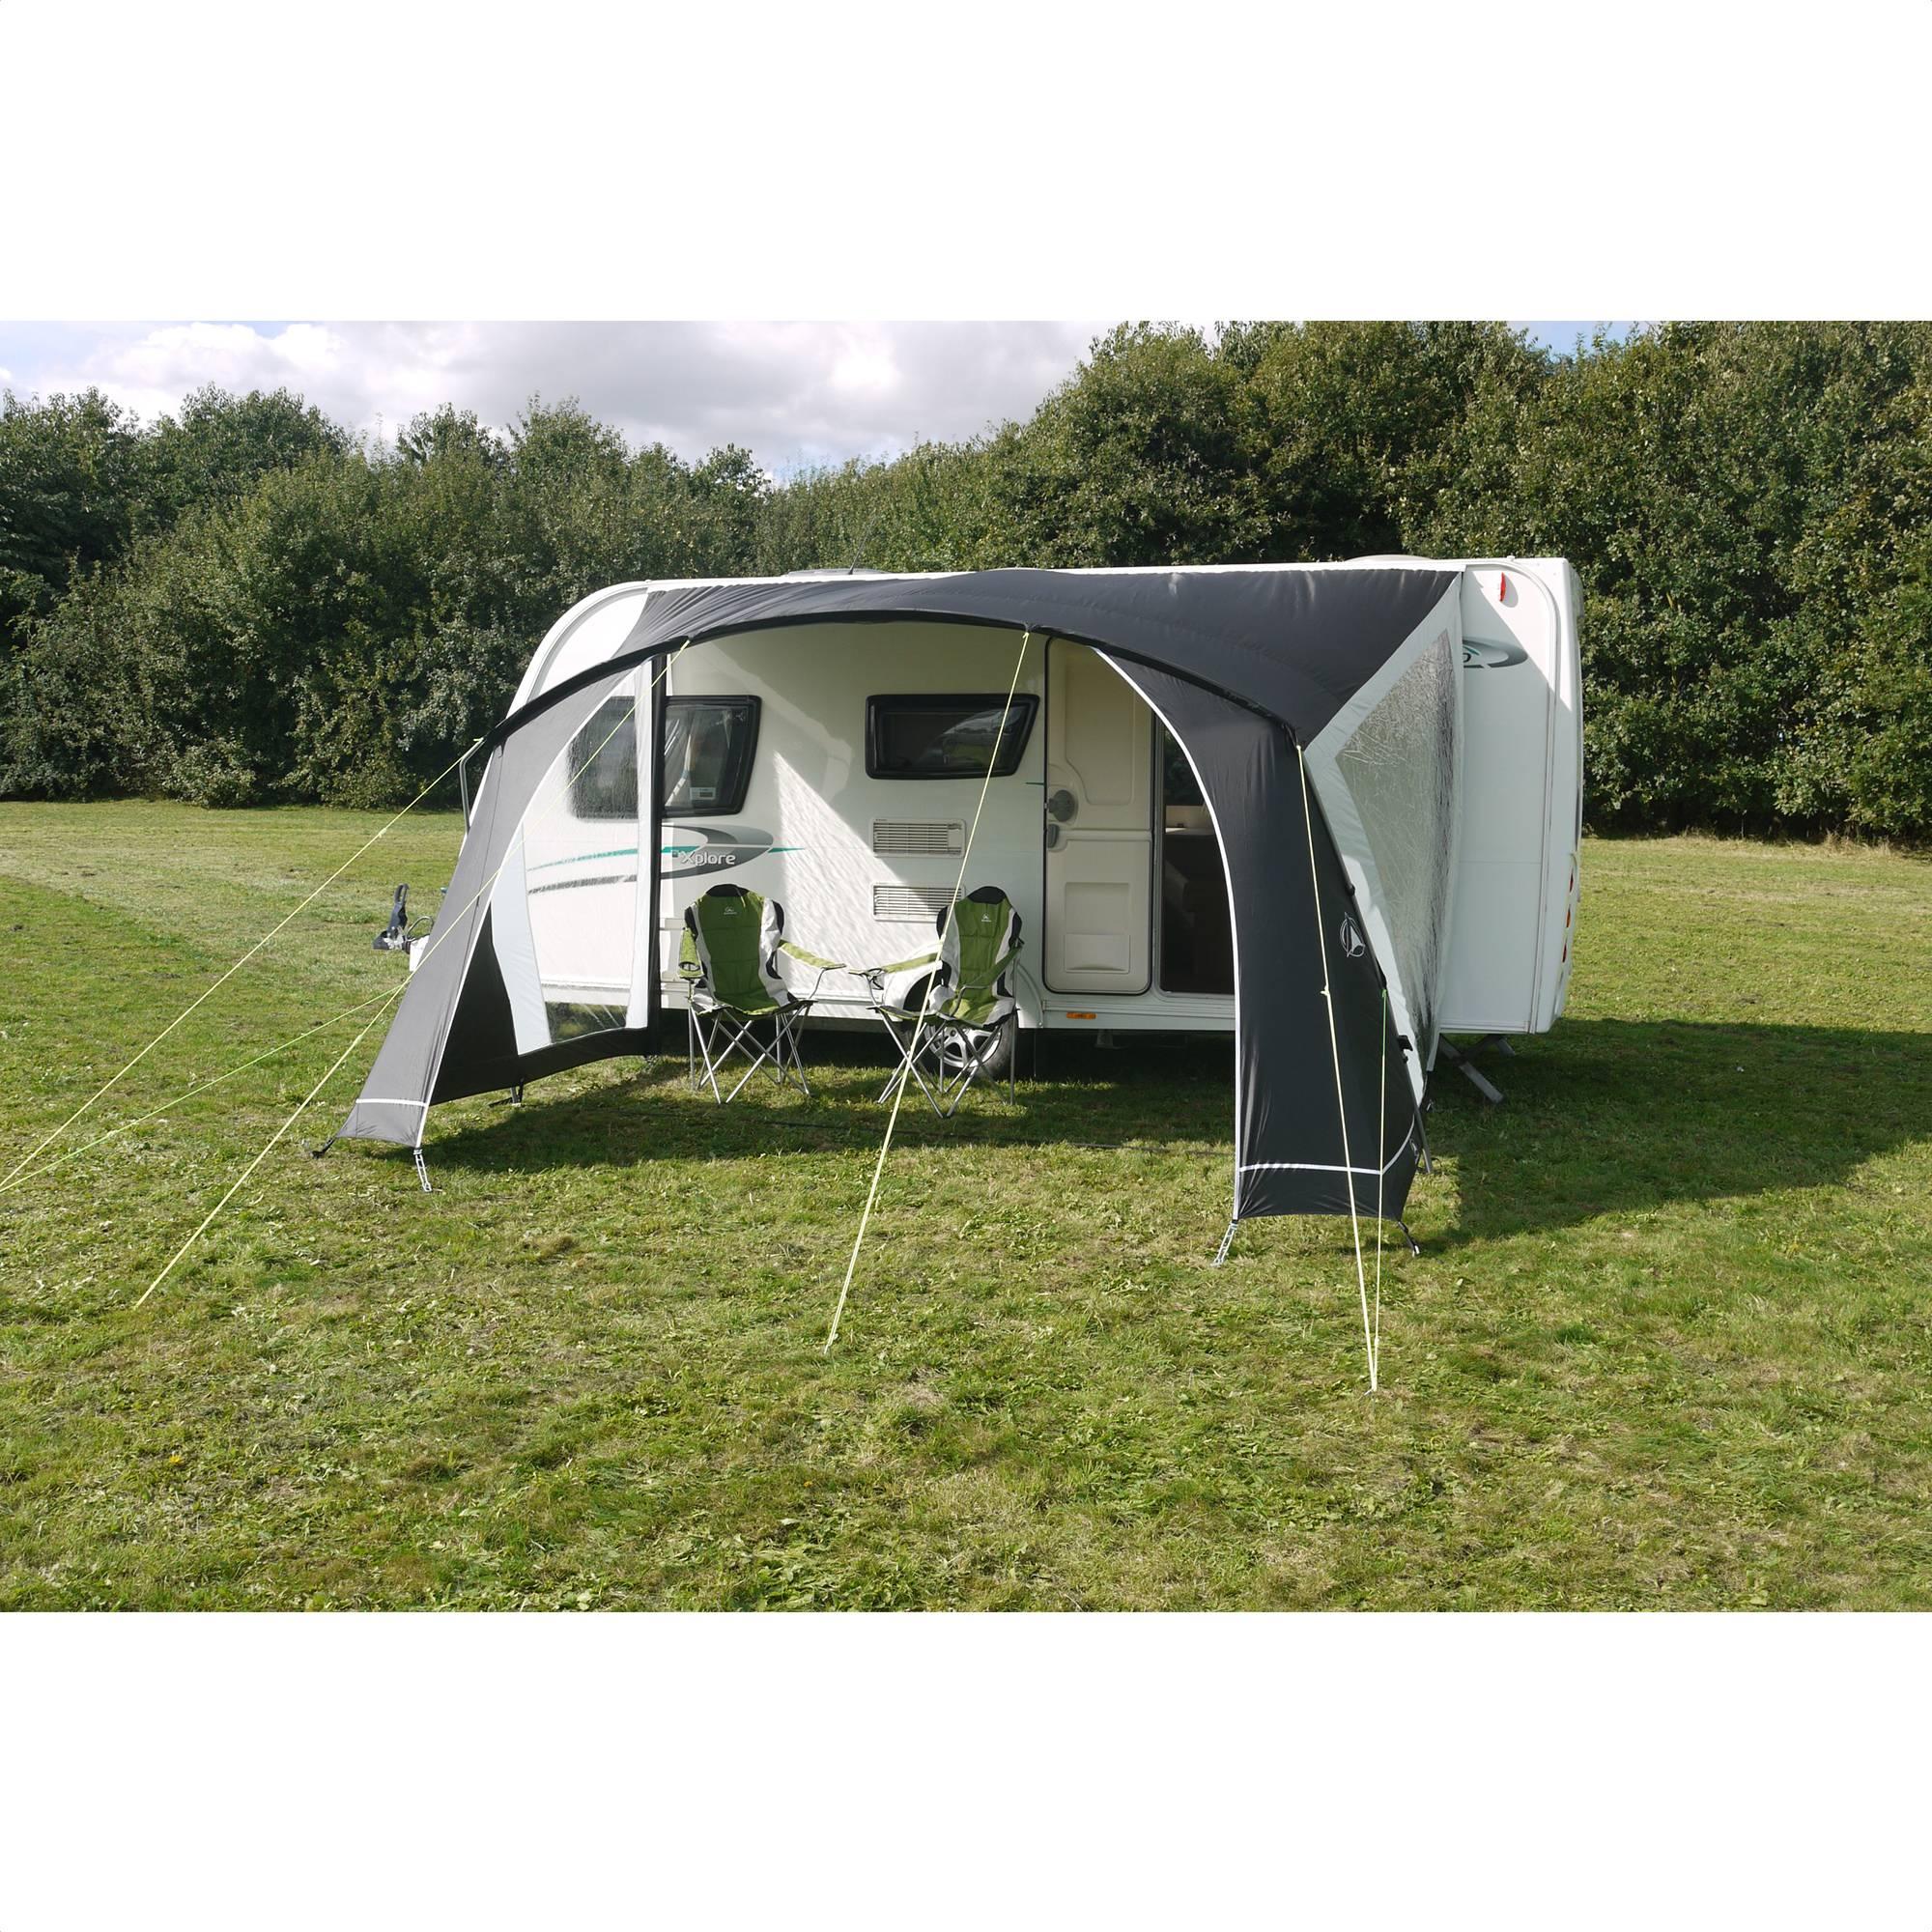 SunnCamp Swift Canopy 390 Caravan Awning